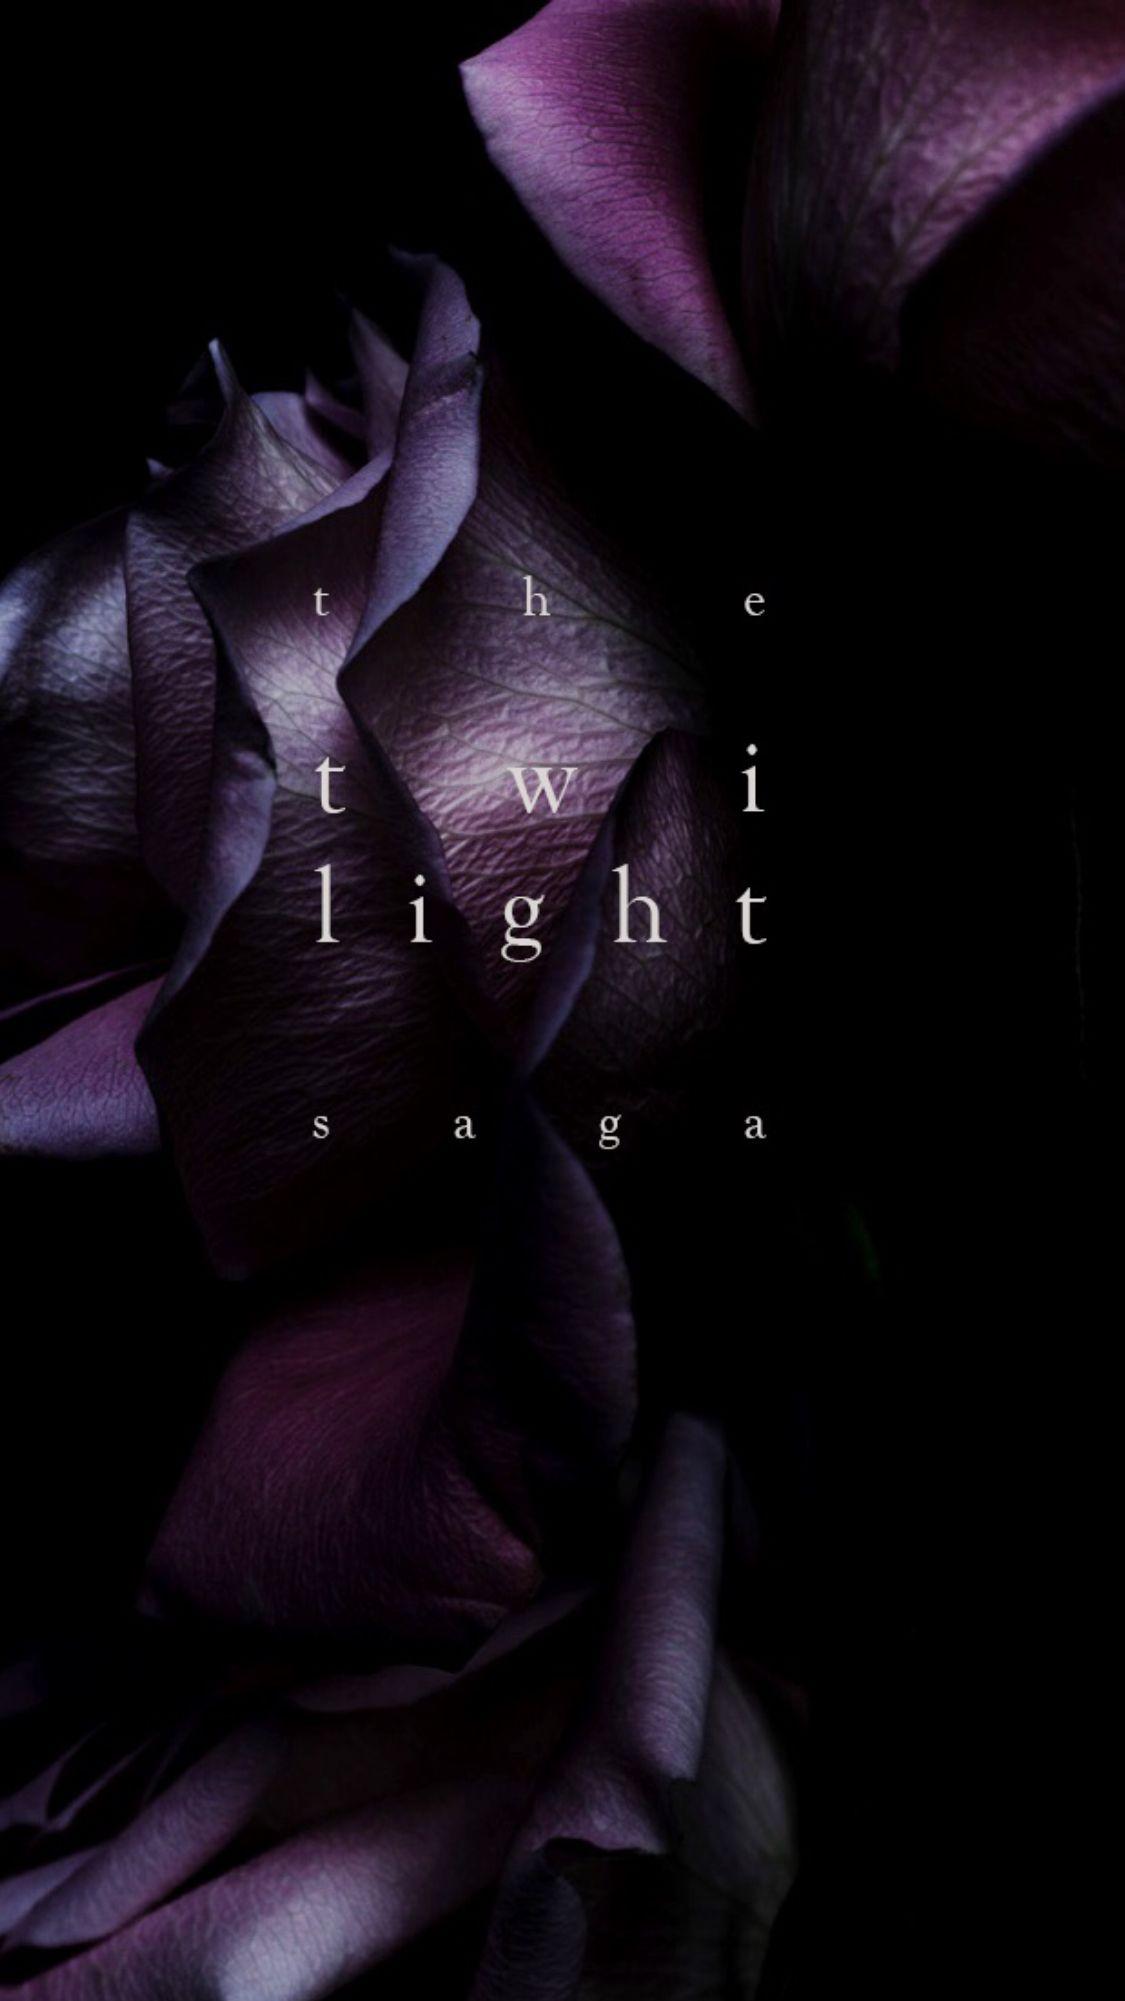 The Twilight Saga Twilight Saga Iphone Wallpaper Art Wallpaper Iphone